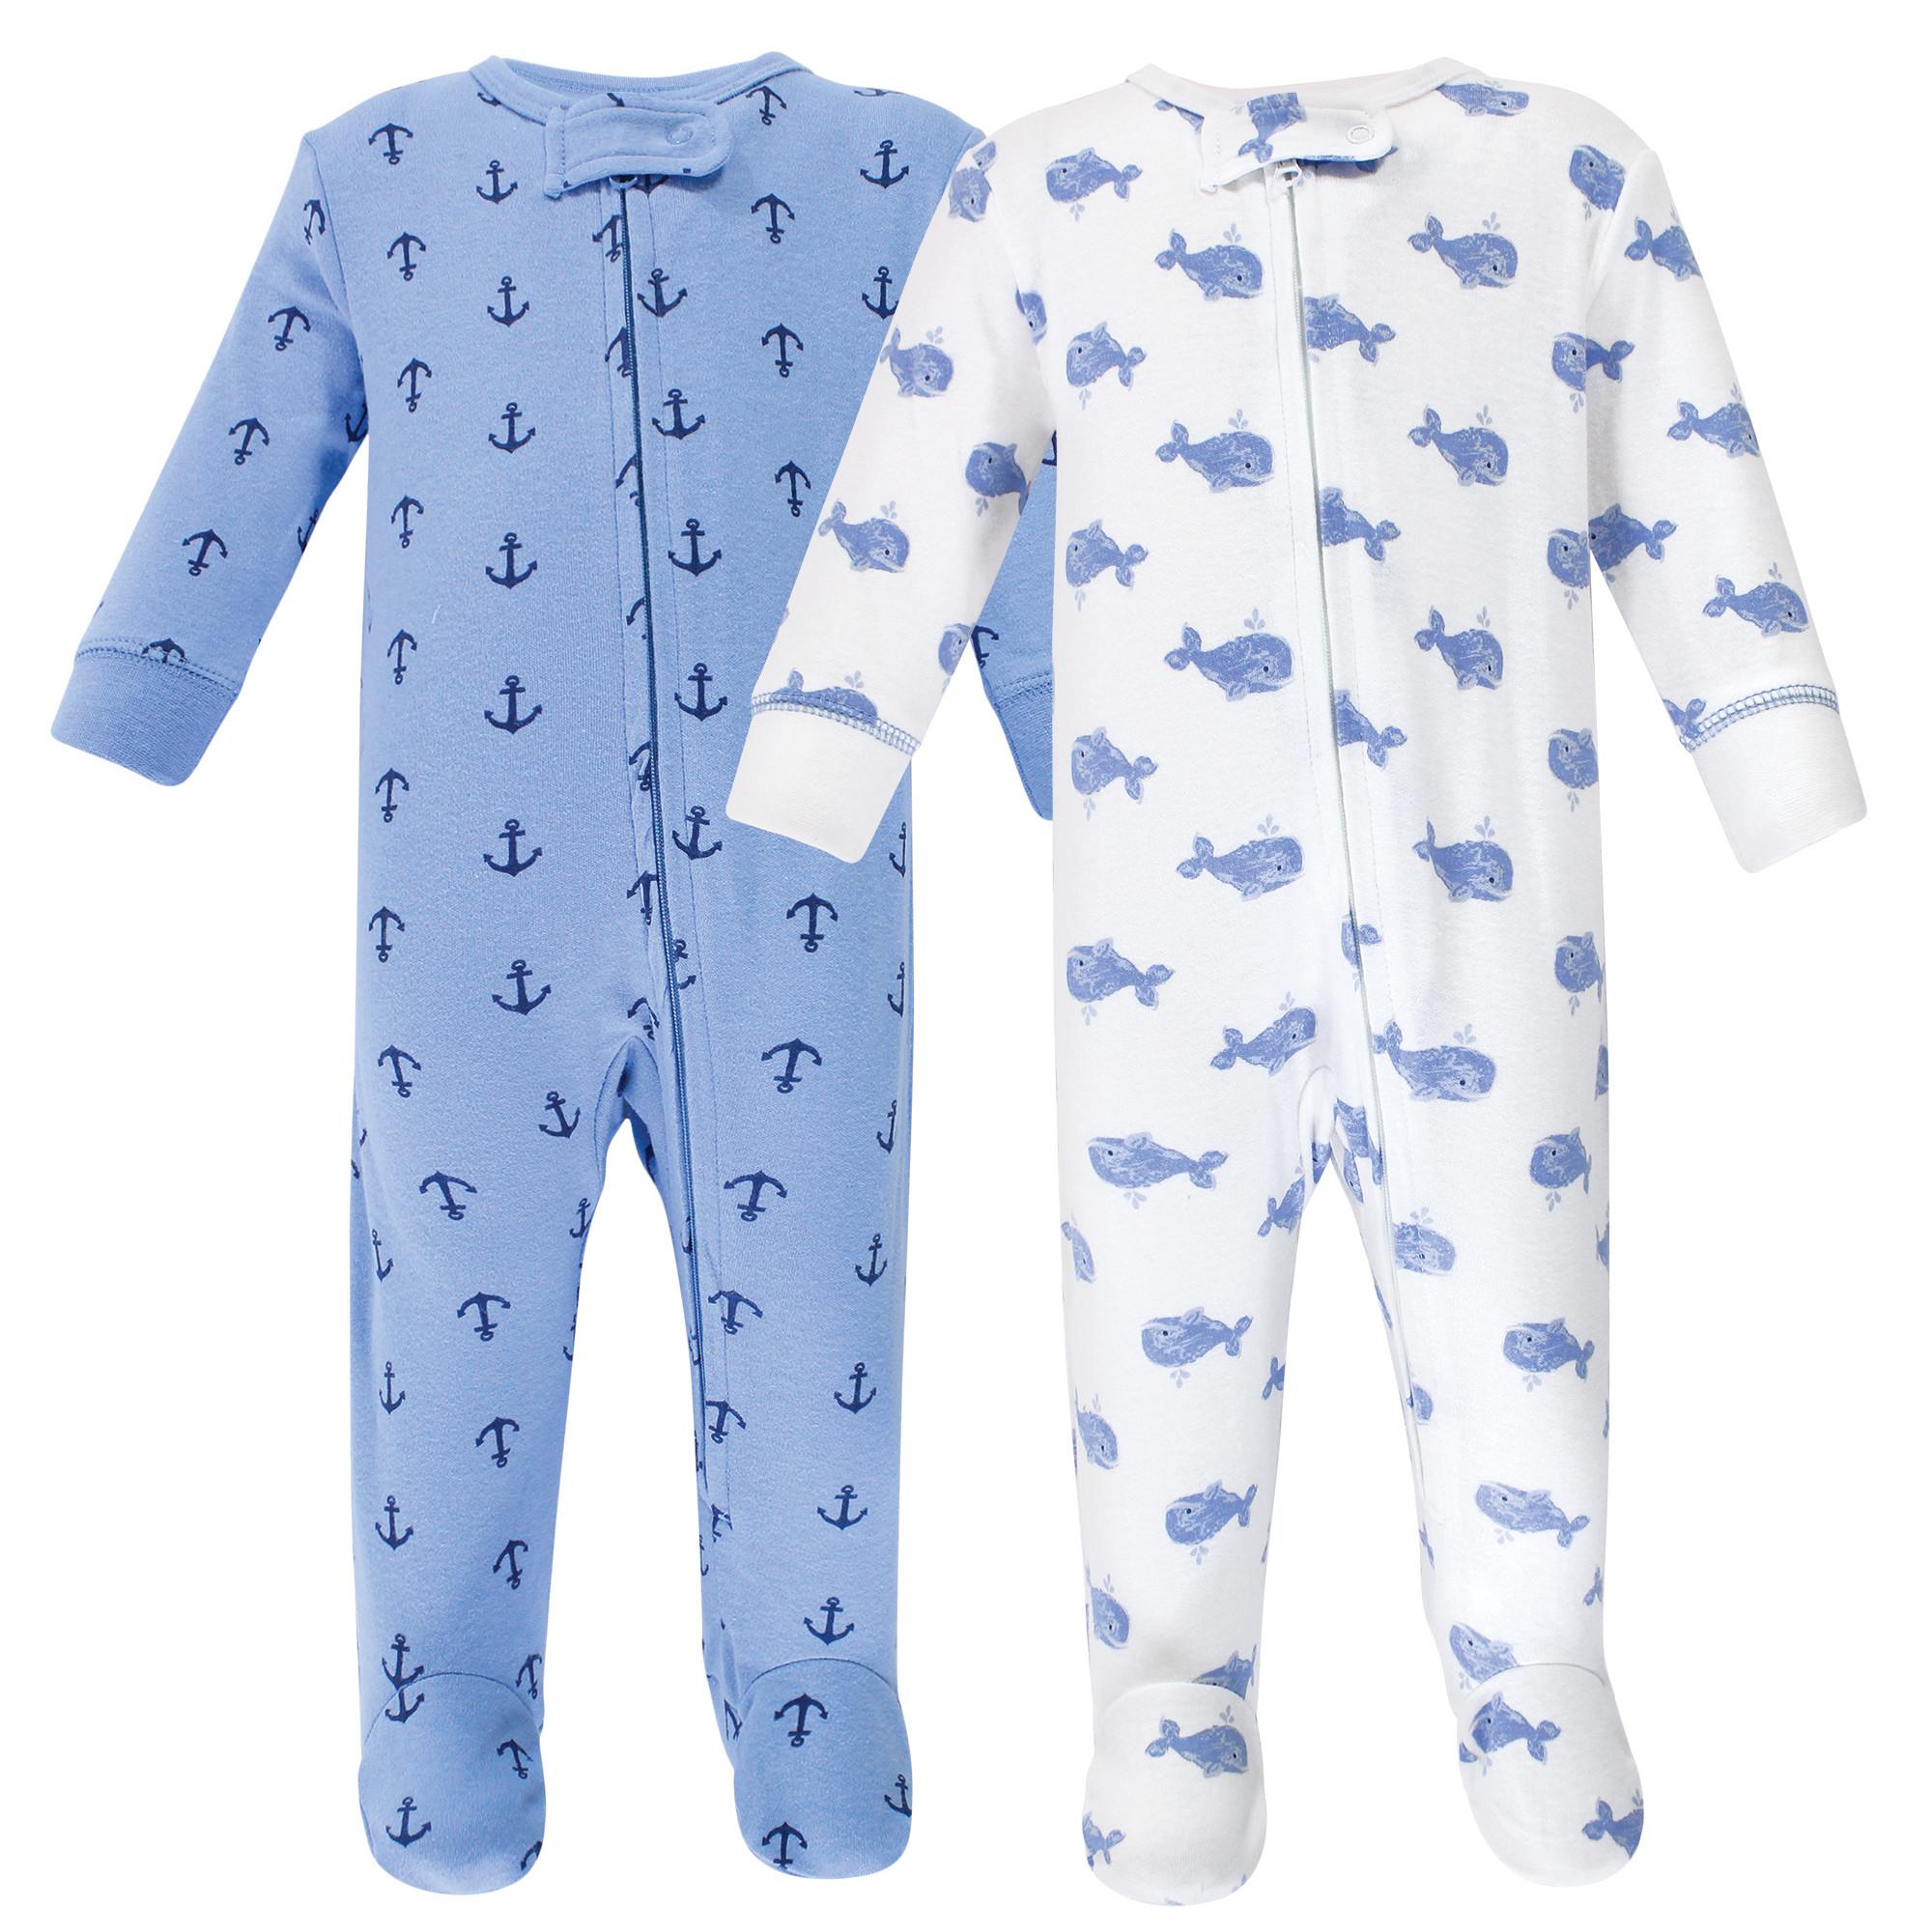 Hudson Baby Boy Zipper Sleep N Play 2-Pack Blue Whales